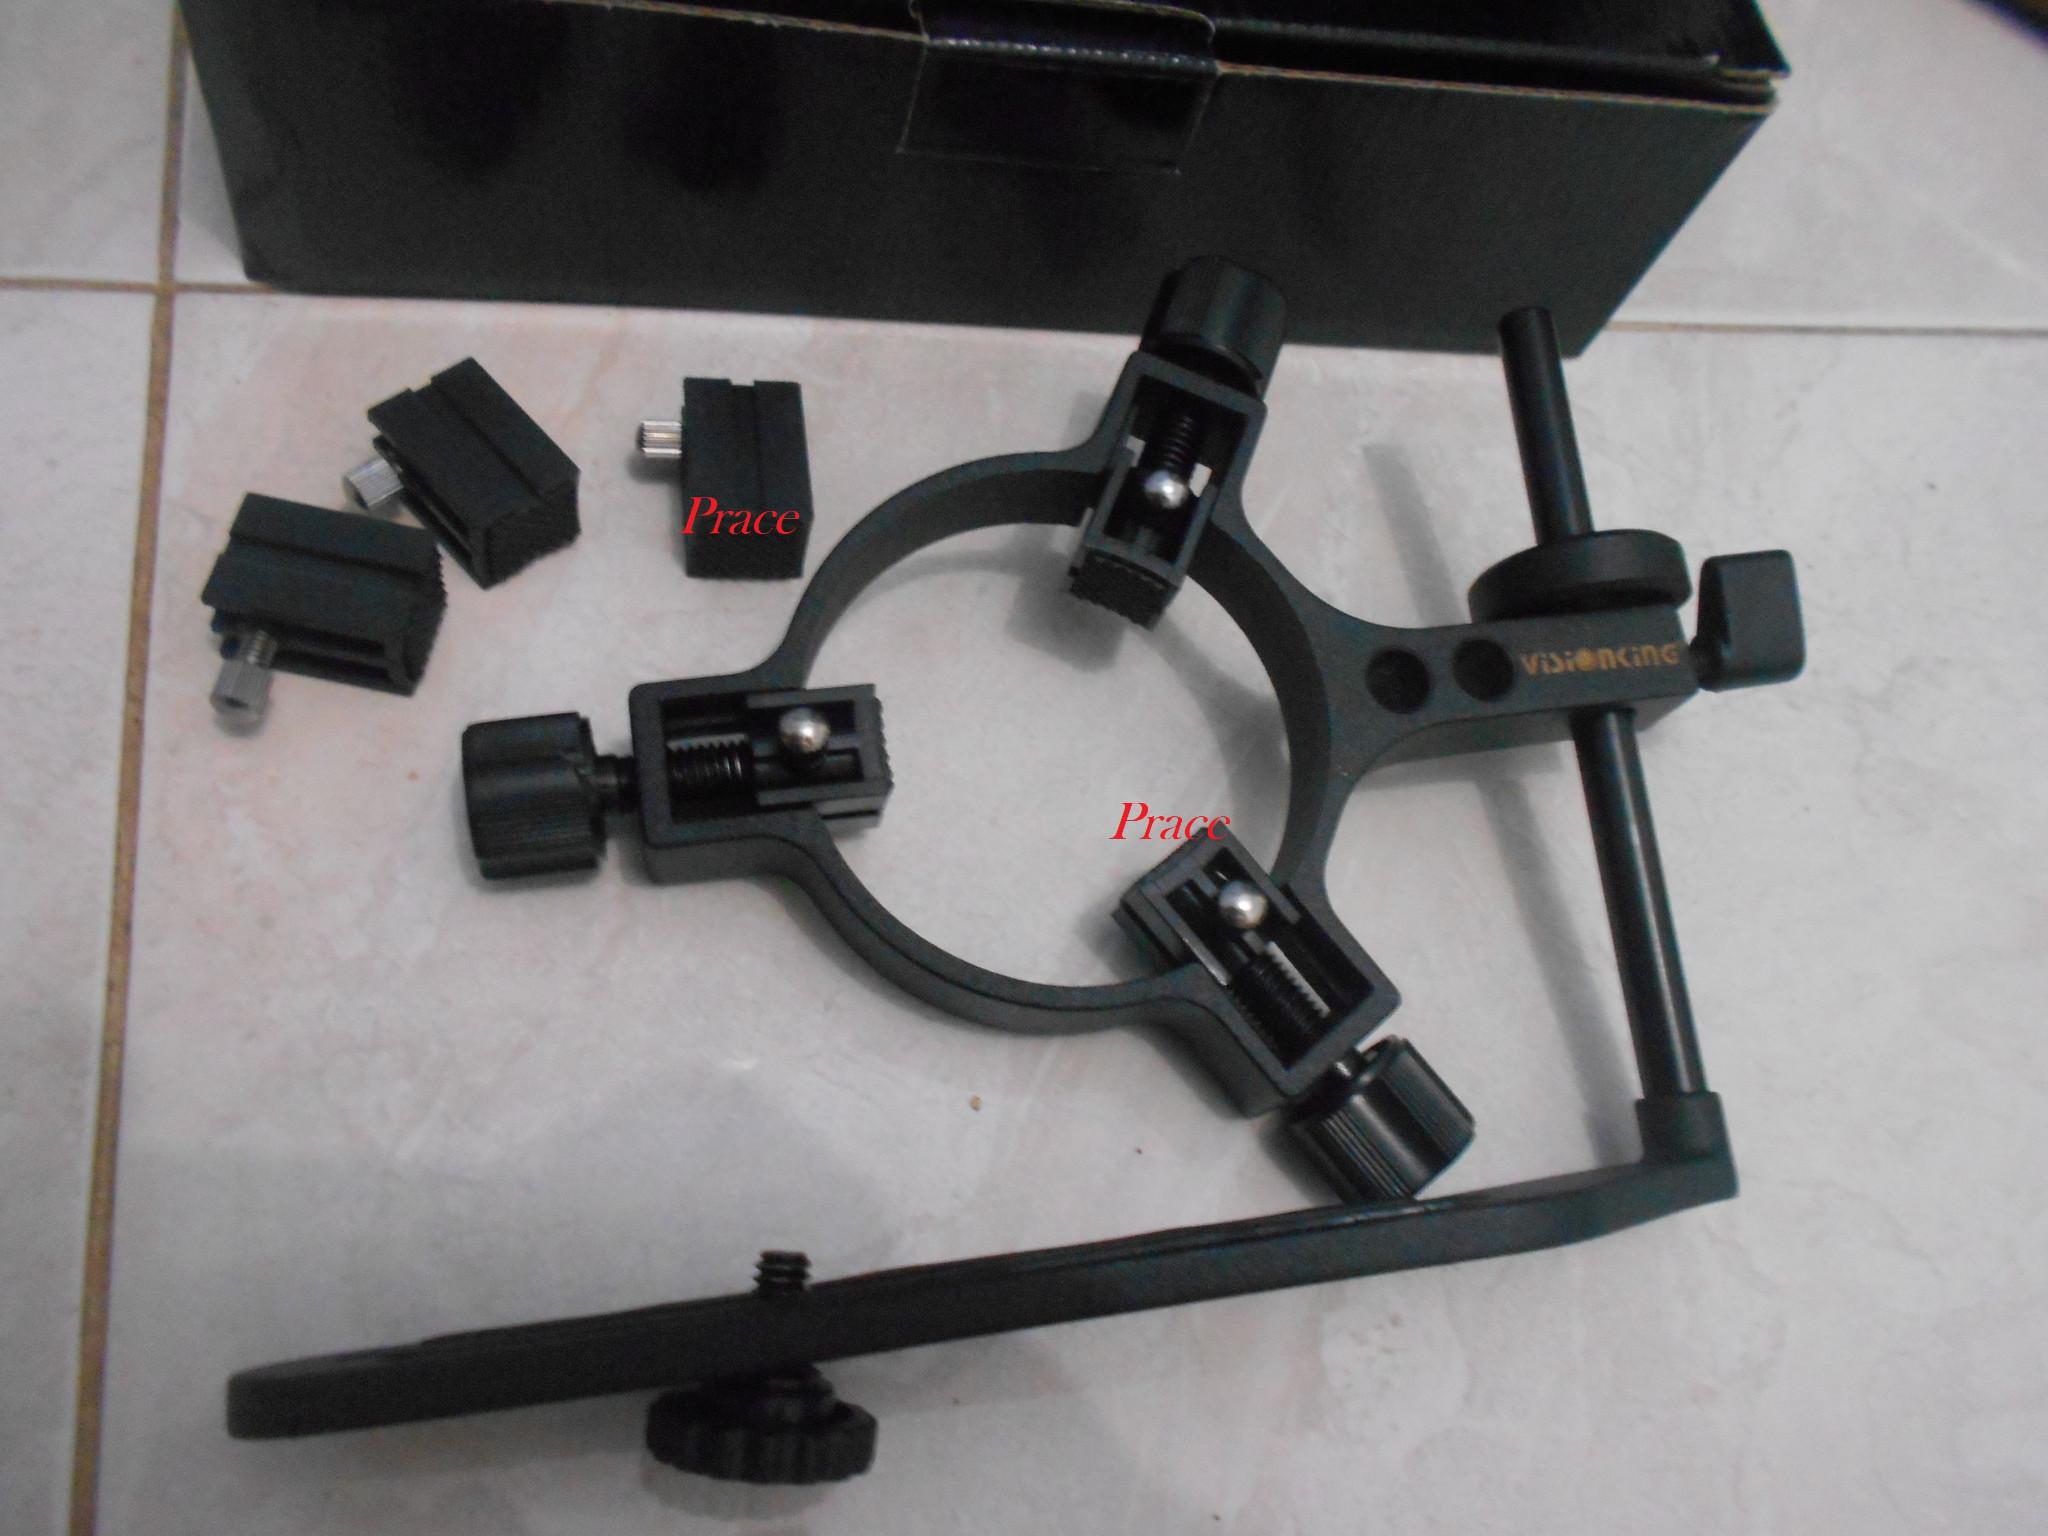 Sepenuhnya logam teleskop kamera adapter smartphone adapter dengan